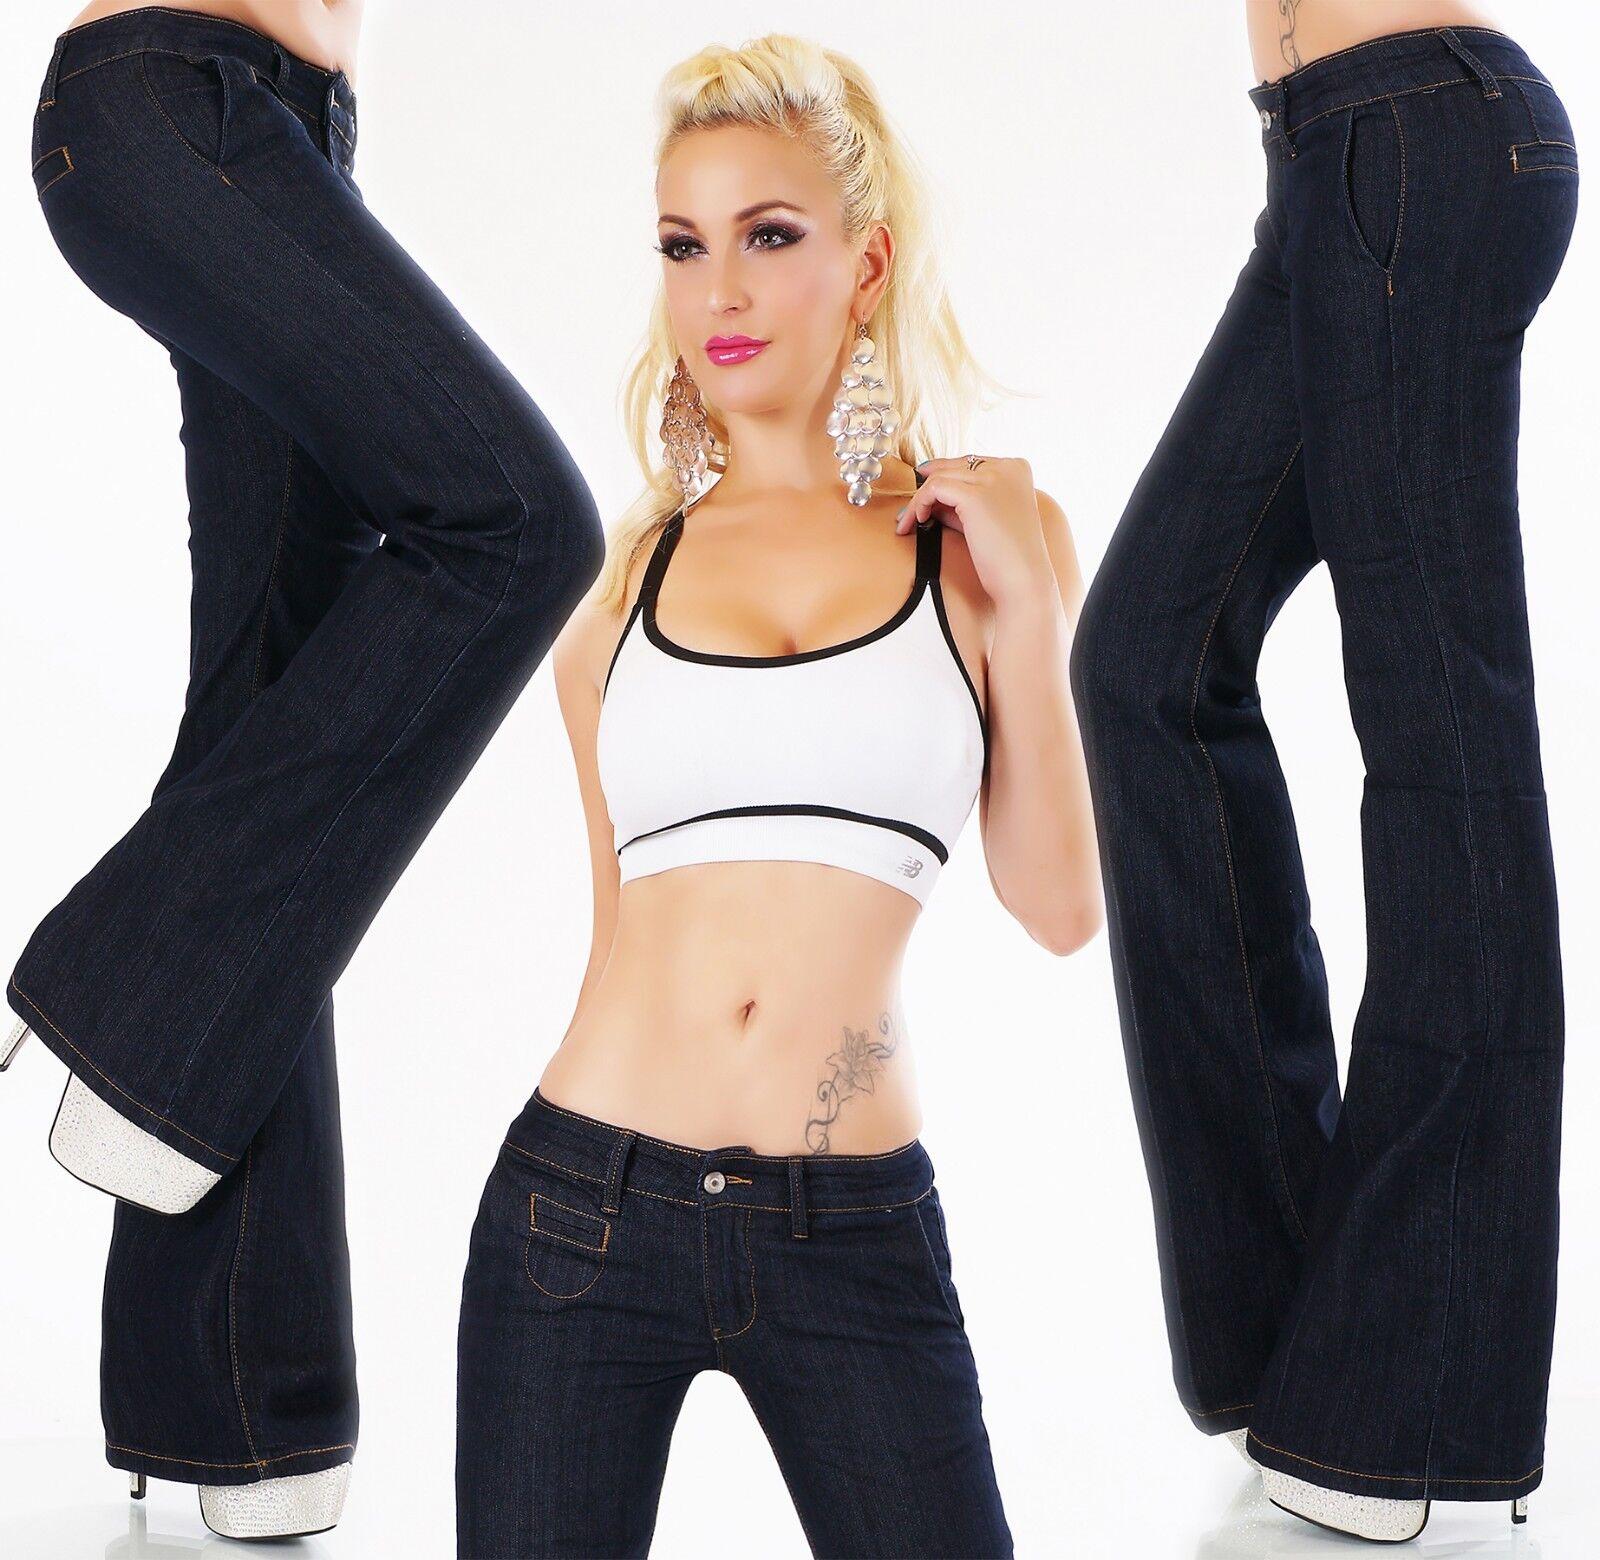 Women's Jeans Hip Pants Bootcut Flarecut Flares Wider Flare Dark bluee 34-42